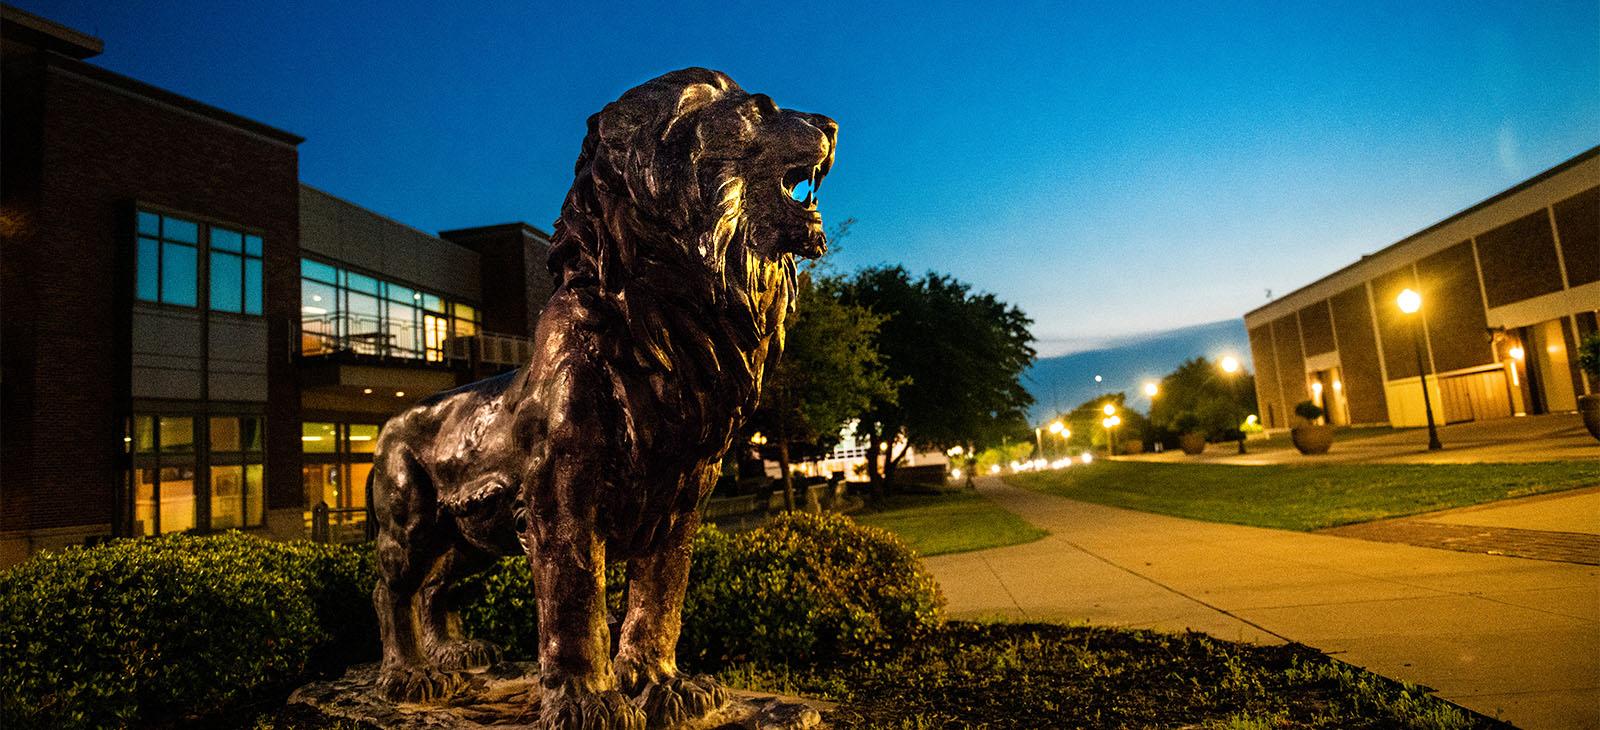 Lion statue on campus.